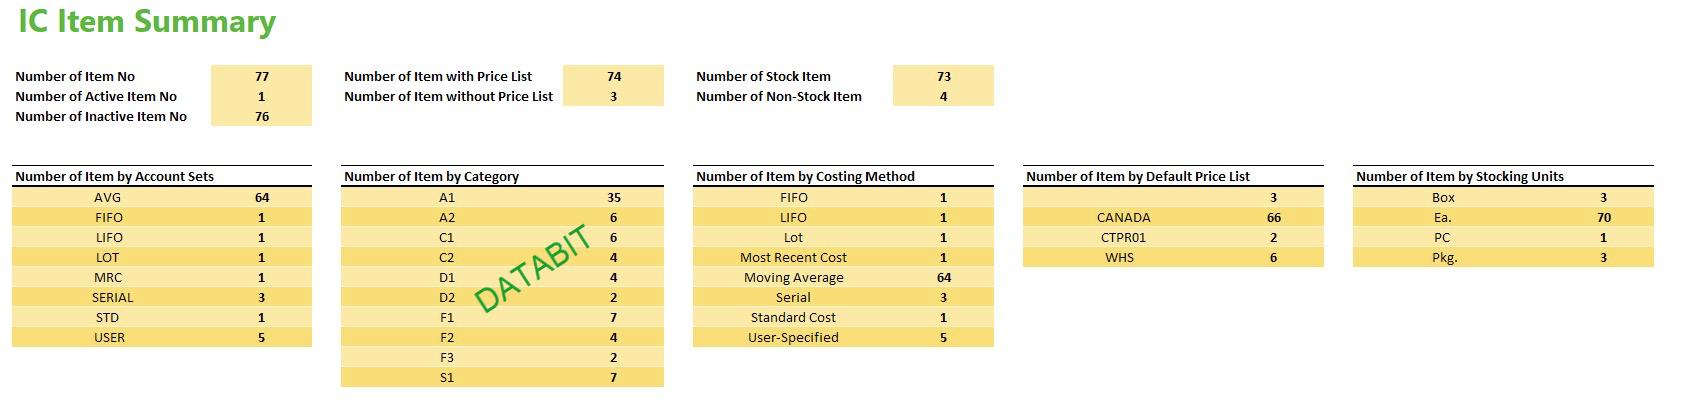 ic item summary